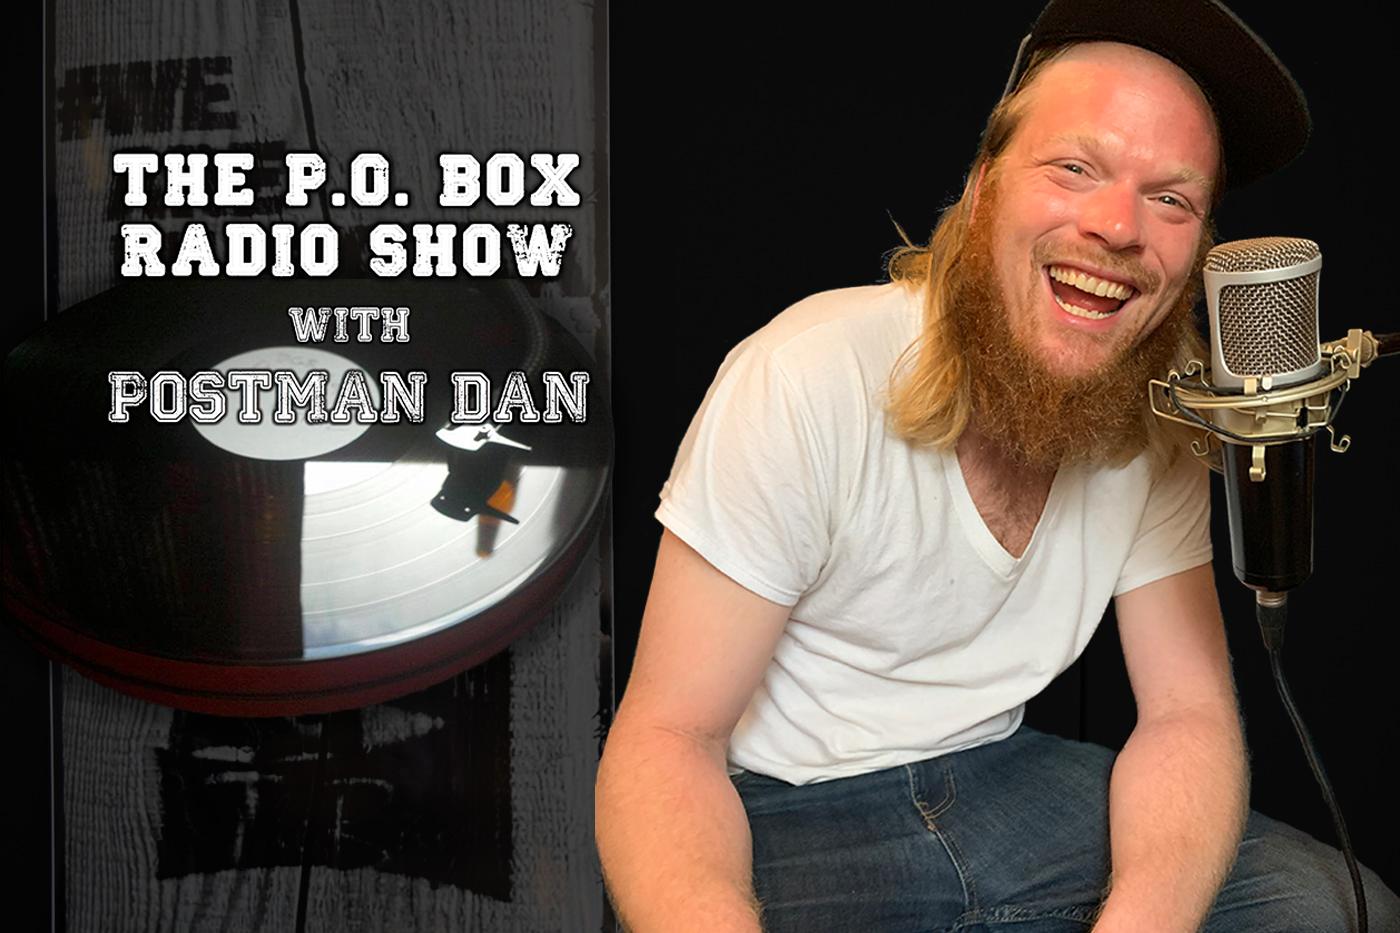 The P.O. Box Radio Show